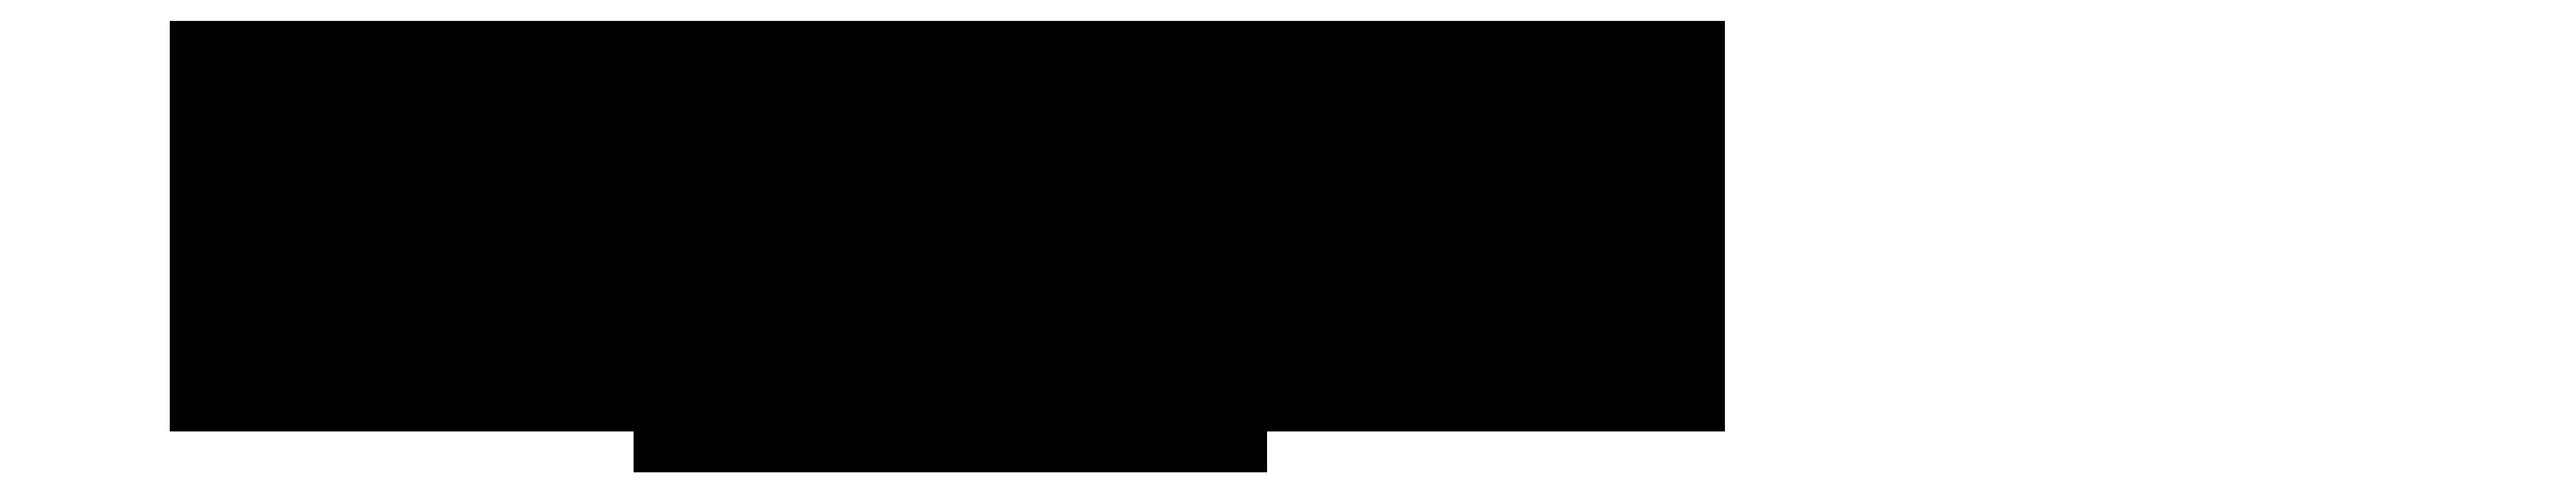 Typeface-Novel-Sans-Hairline-F03-Atlas-Font-Foundry